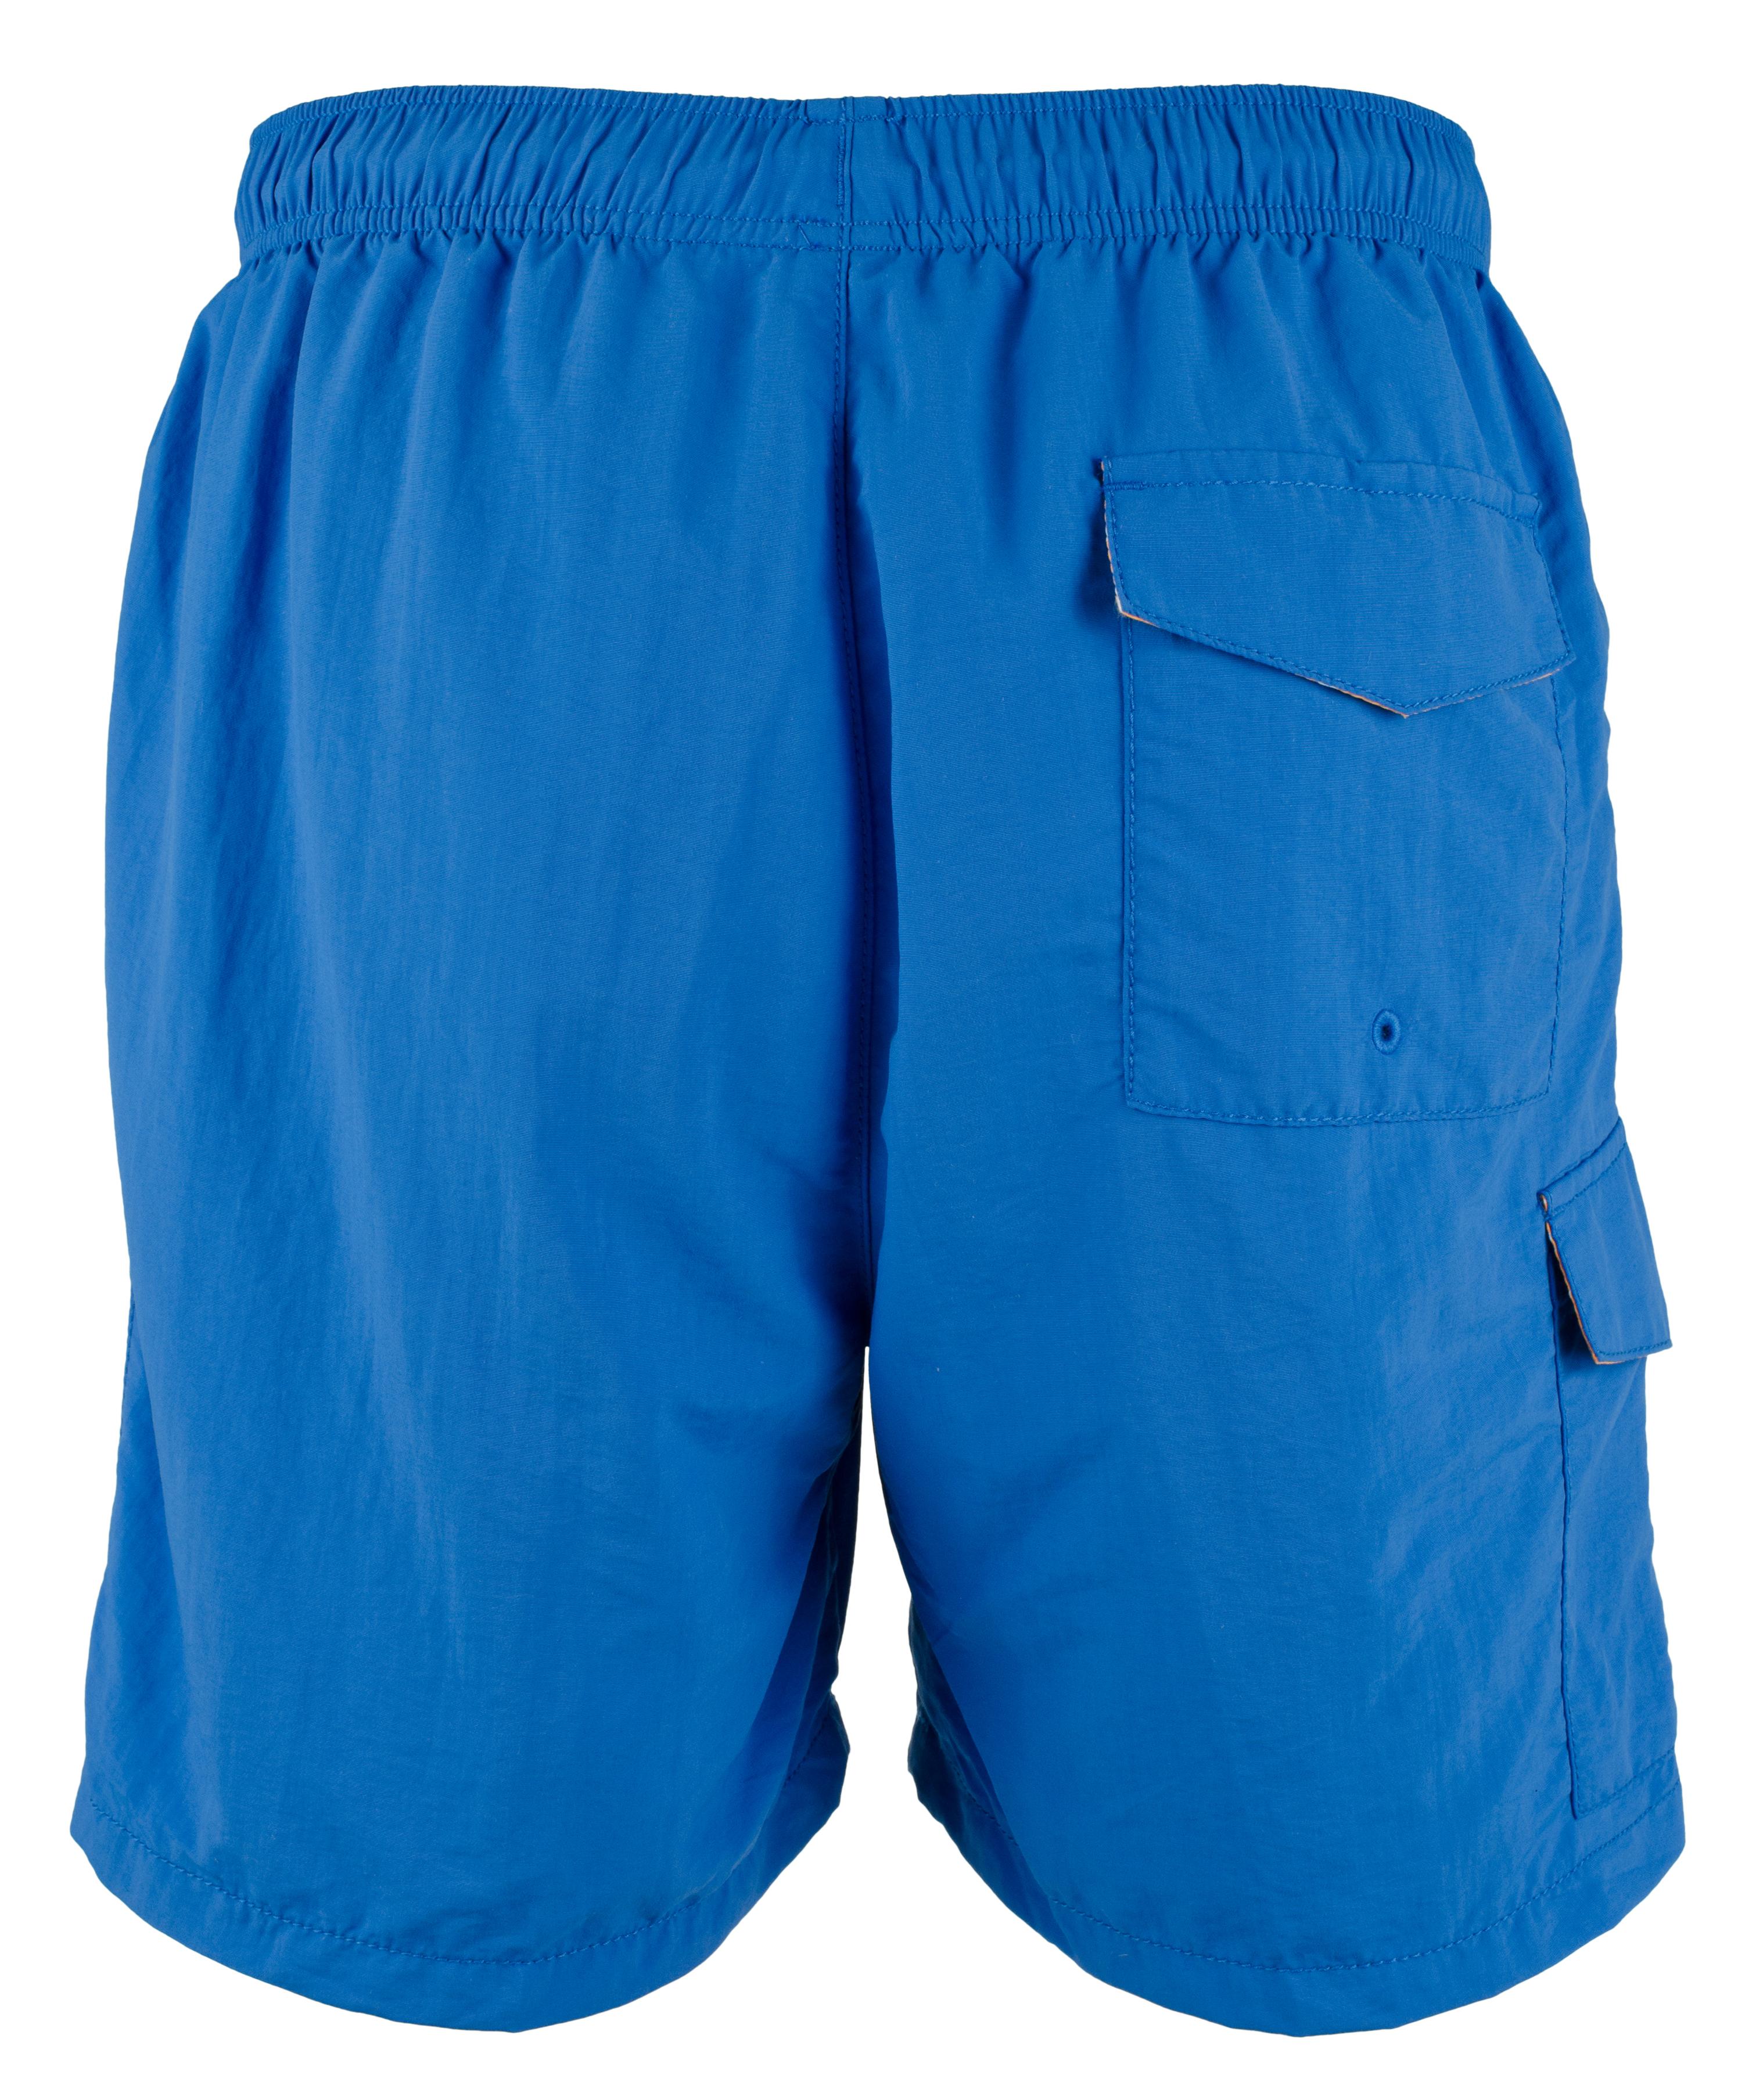 NEW TOMMY BAHAMA Naples Coastal Santorini blue swim trunks Small Medium Large XL